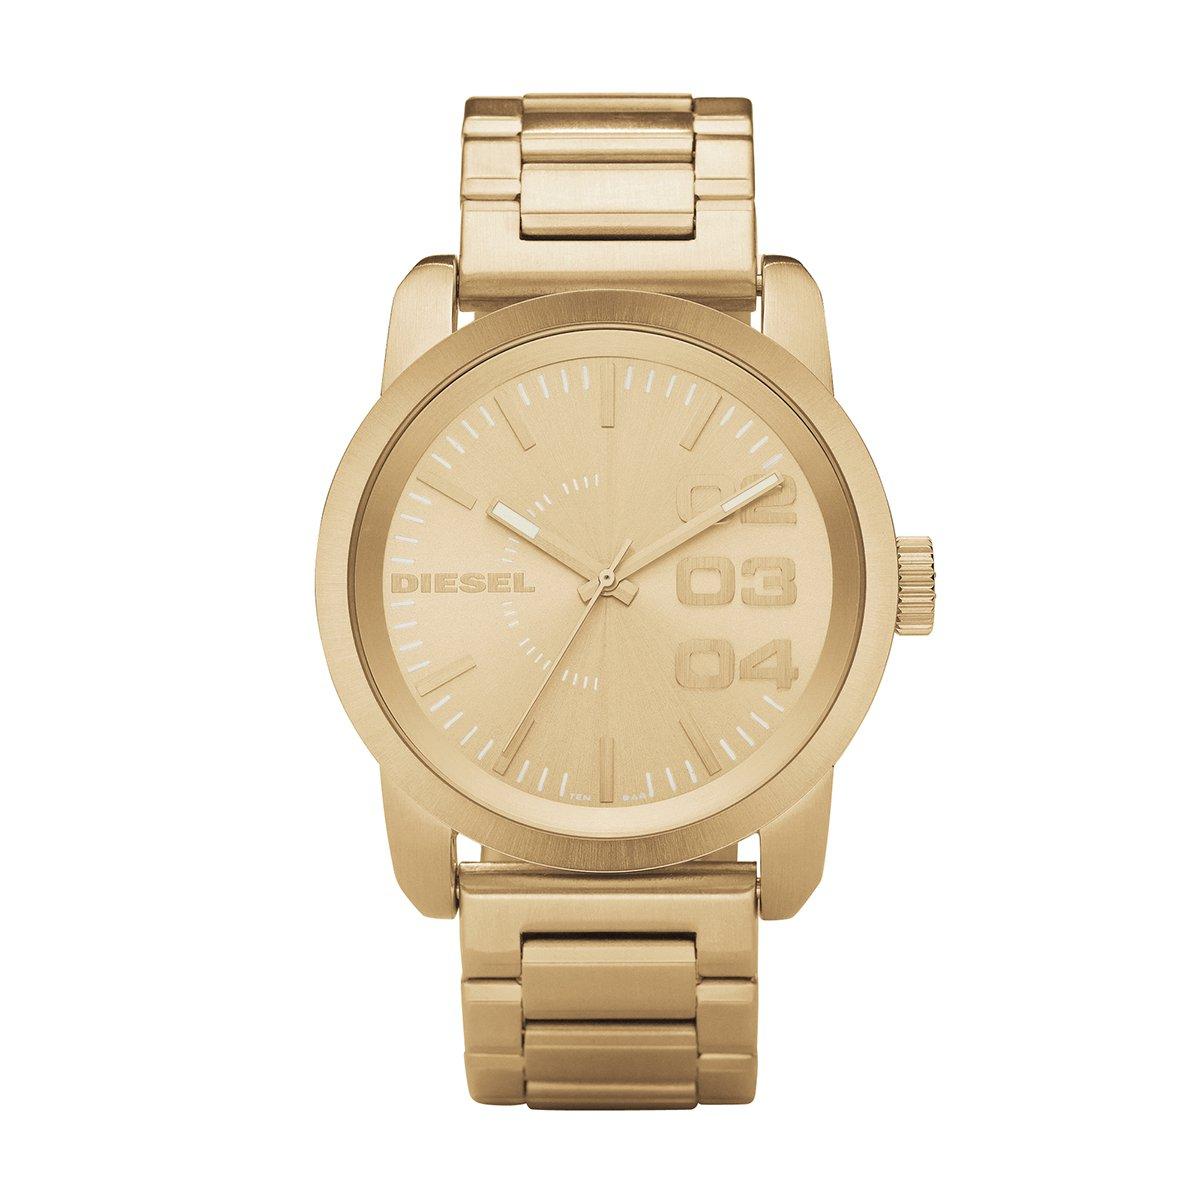 ffbba82e504 Relógio Diesel Analógico Dourado - Compre Agora